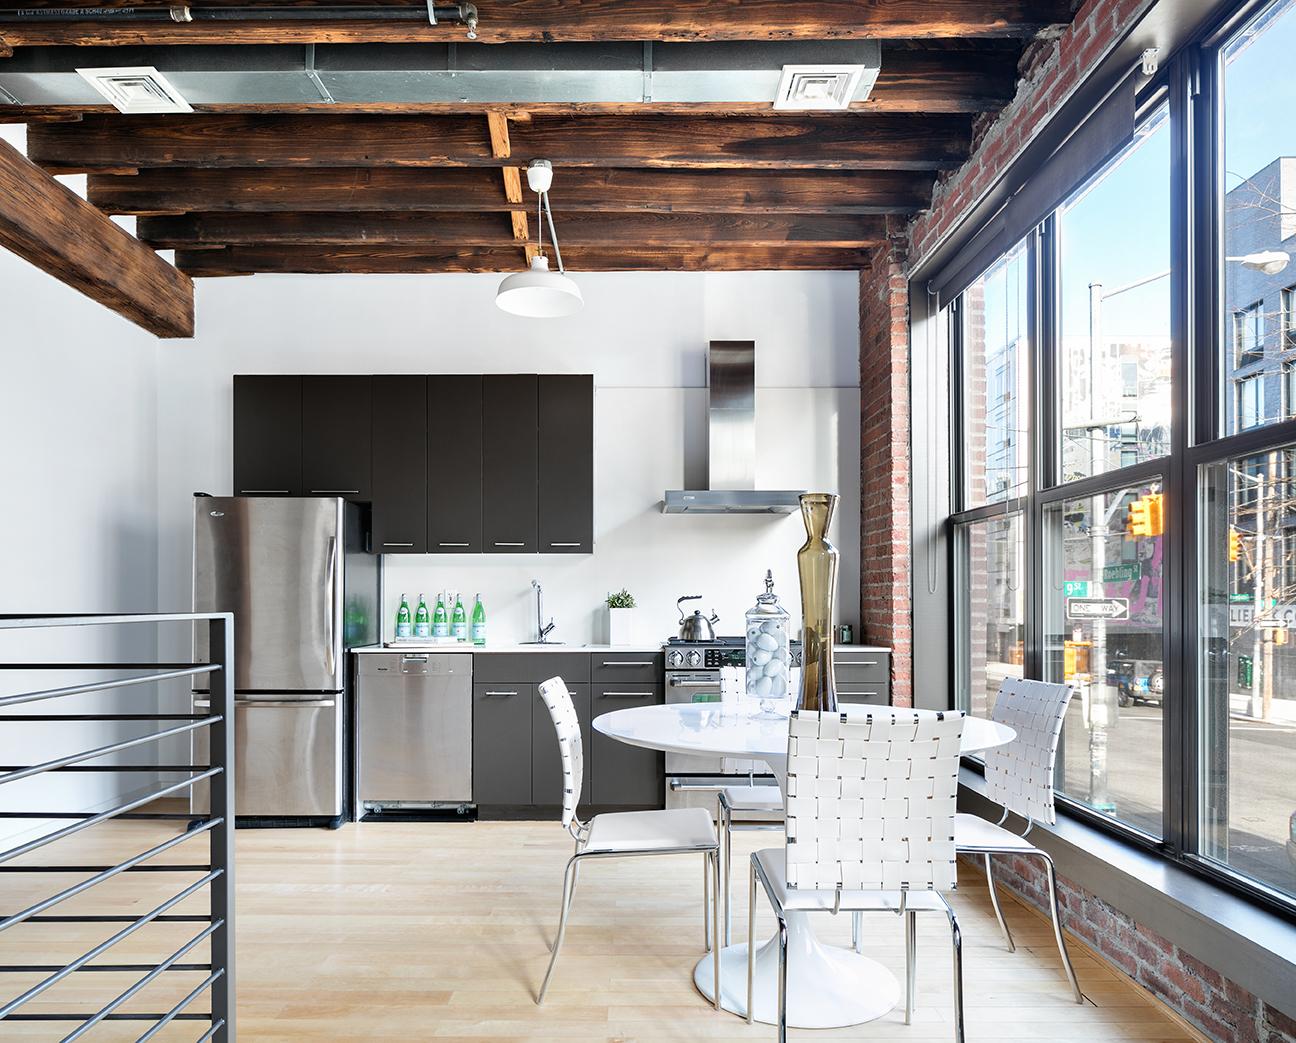 234 North 9th Street, dining room, open kitchen, loft, condo, duplex, williamsburg